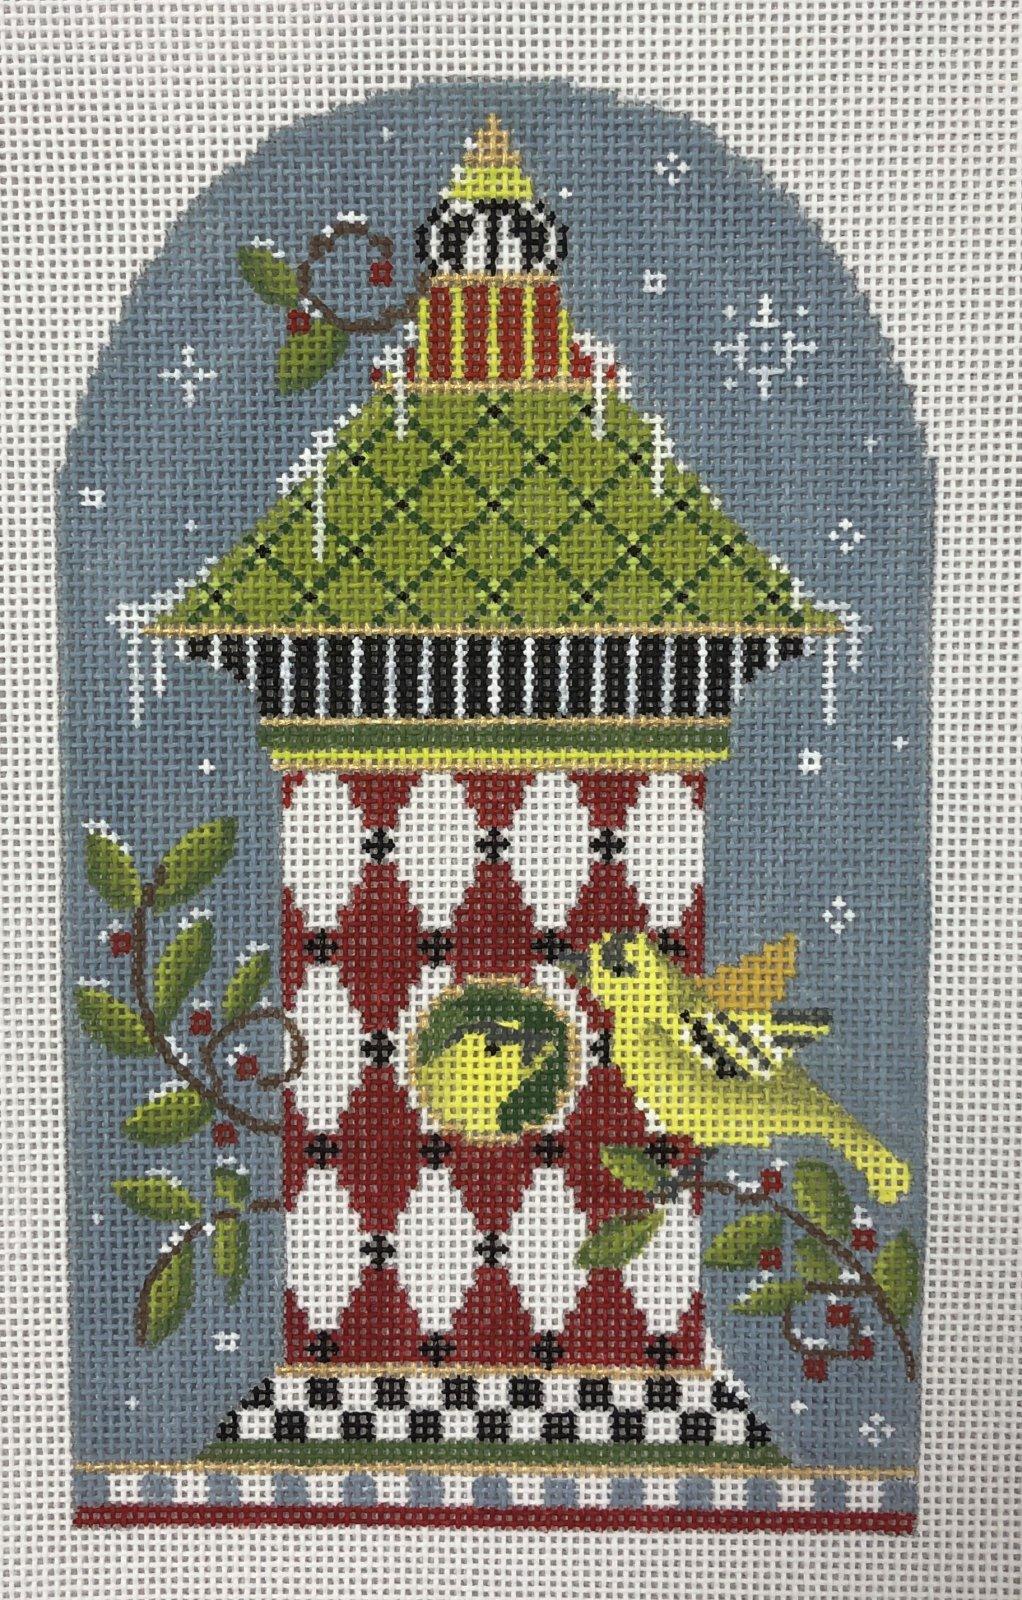 birdhouse, winter  12